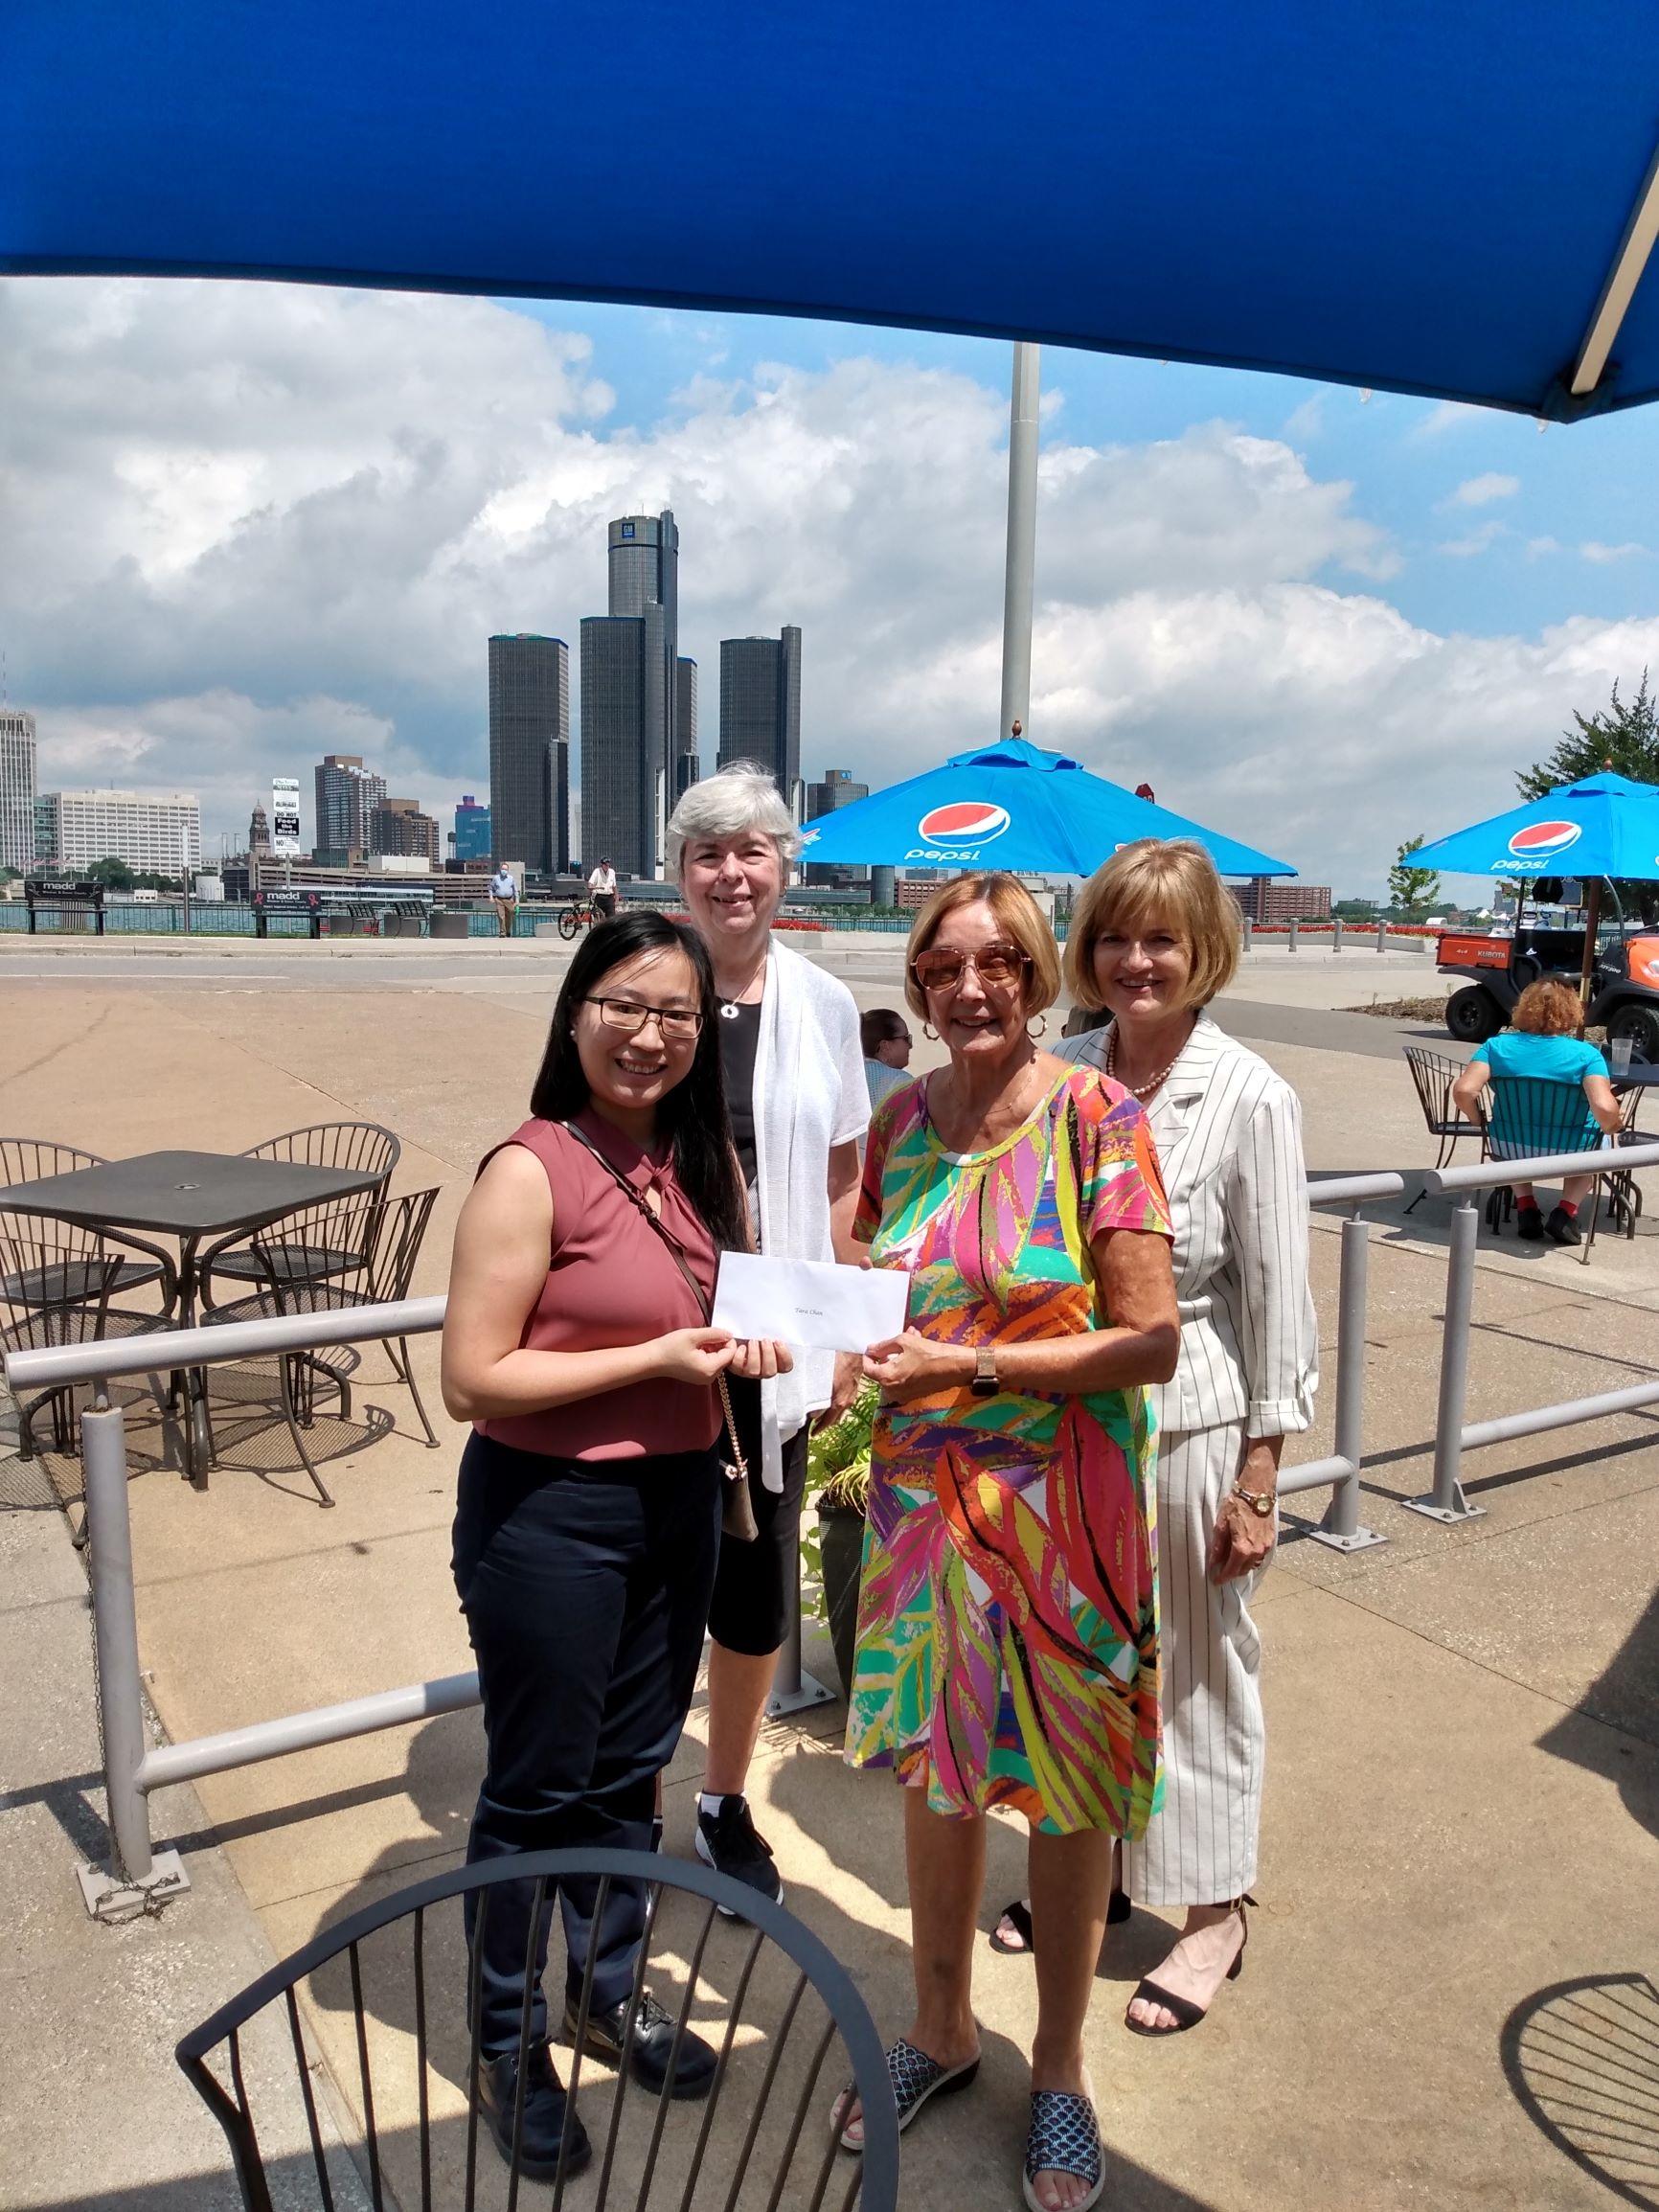 Tara Chan (Faculty of Law, University of Windsor Recipient), Sue Zanin (Past Chair, ATHENA Committee), Loretta Stoyka (Founder, ATHENA Scholarship Fund (Windsor), Lee Anne Doyle (Chair, ATHENA Committee)